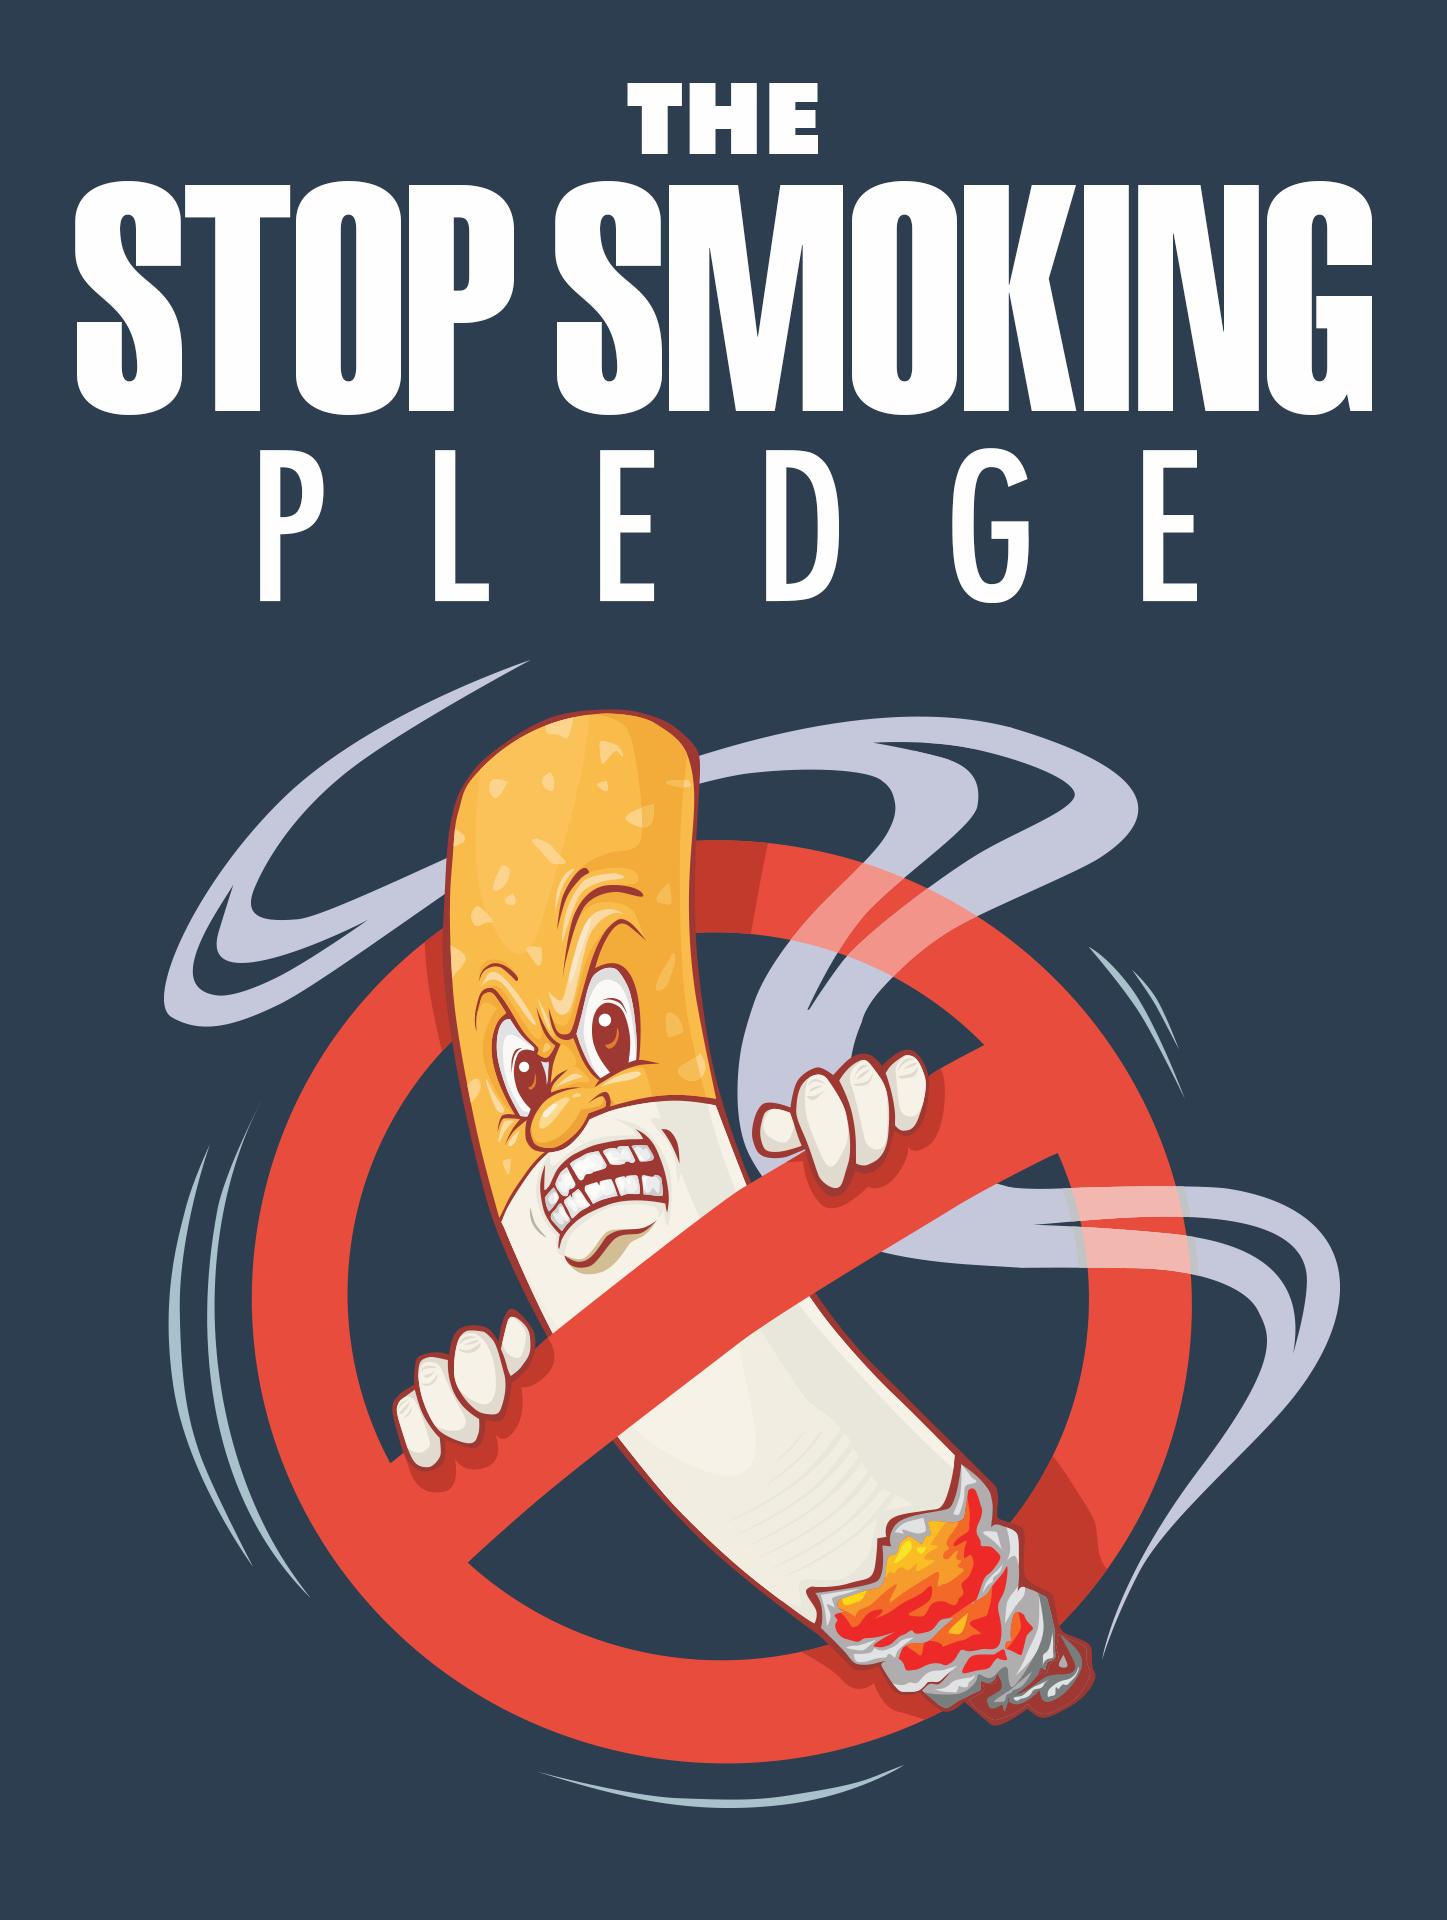 how to stop smoking and maintain the stop smoking